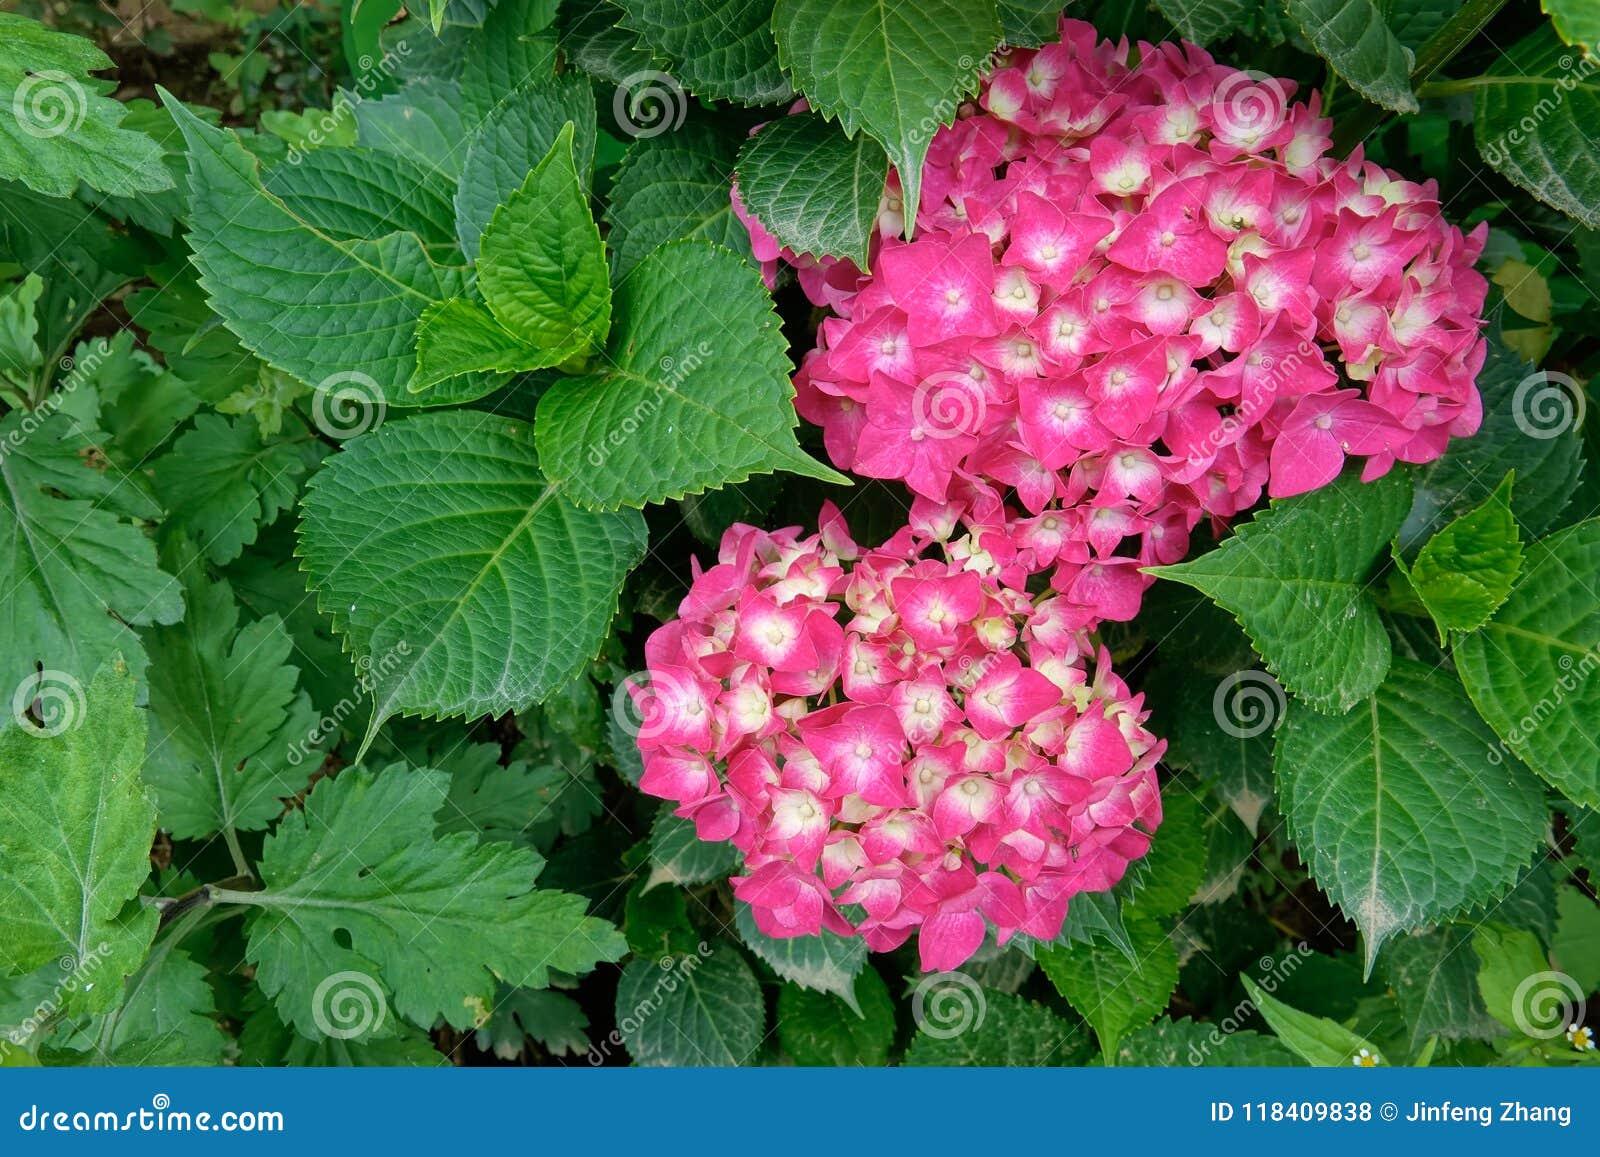 Fiori Hoya.Hoya Carnosa Flowers Stock Photo Image Of Hoya Bloom 118409838